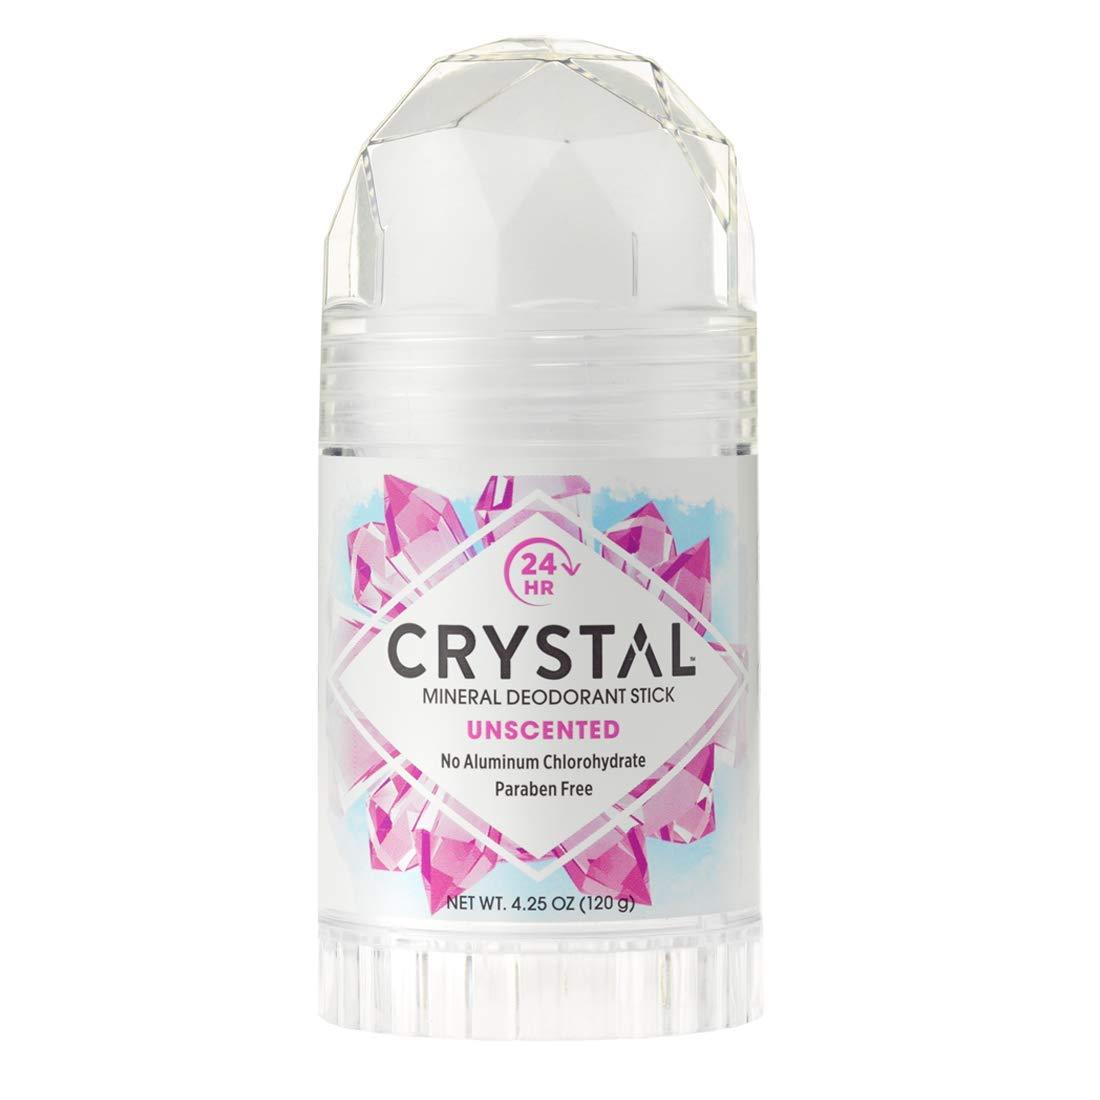 Top 9 Best Deodorant for Kids Reviews in 2021 5